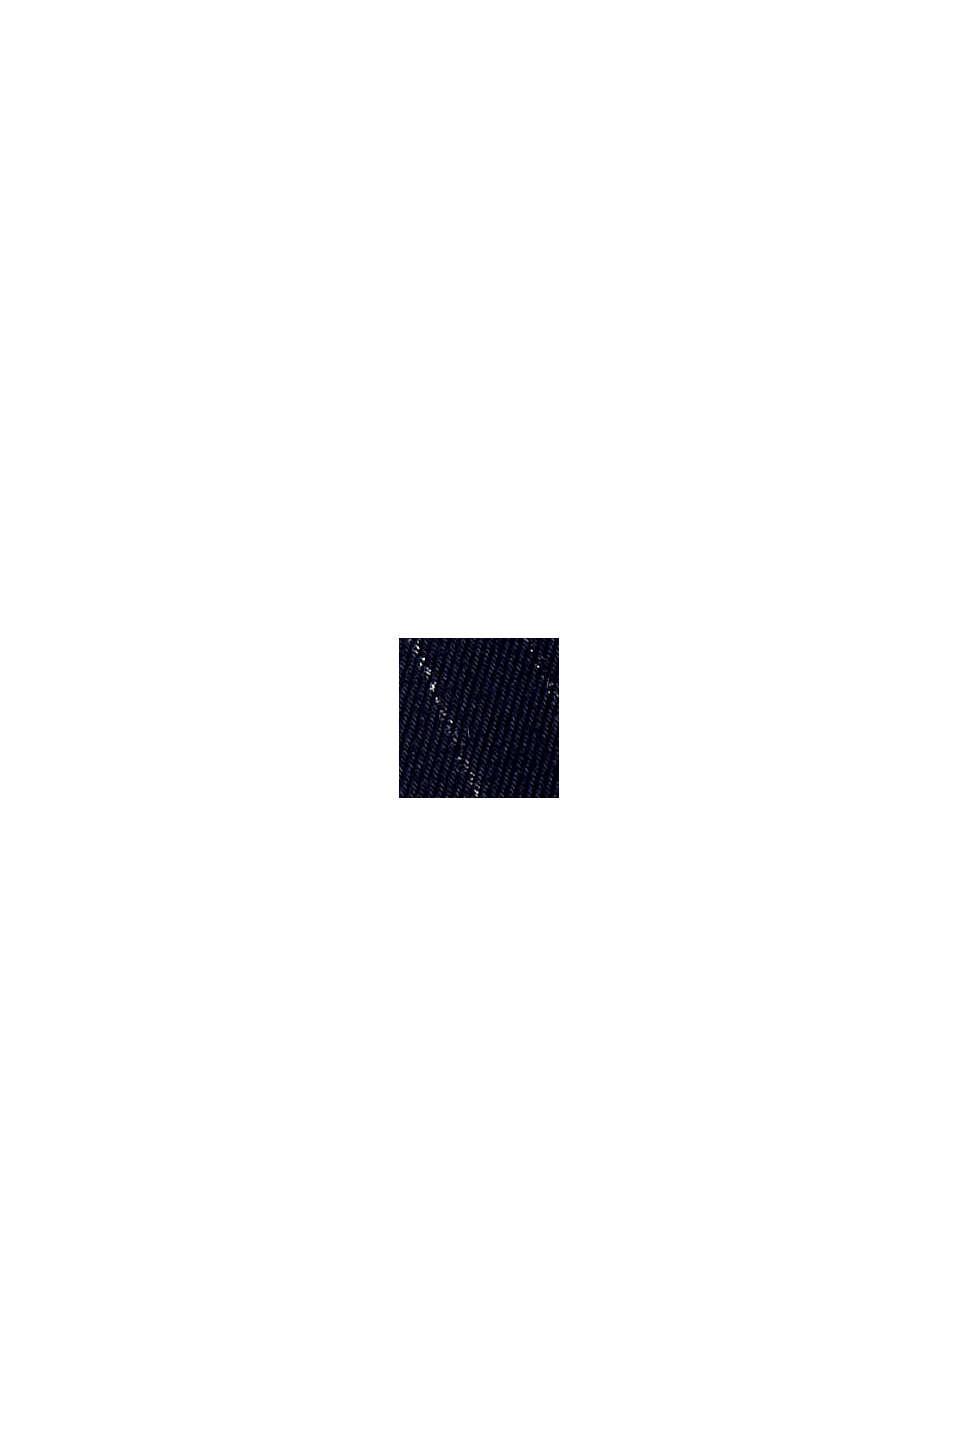 PINSTRIPE Mix + Match Hose aus Flanell, NAVY, swatch